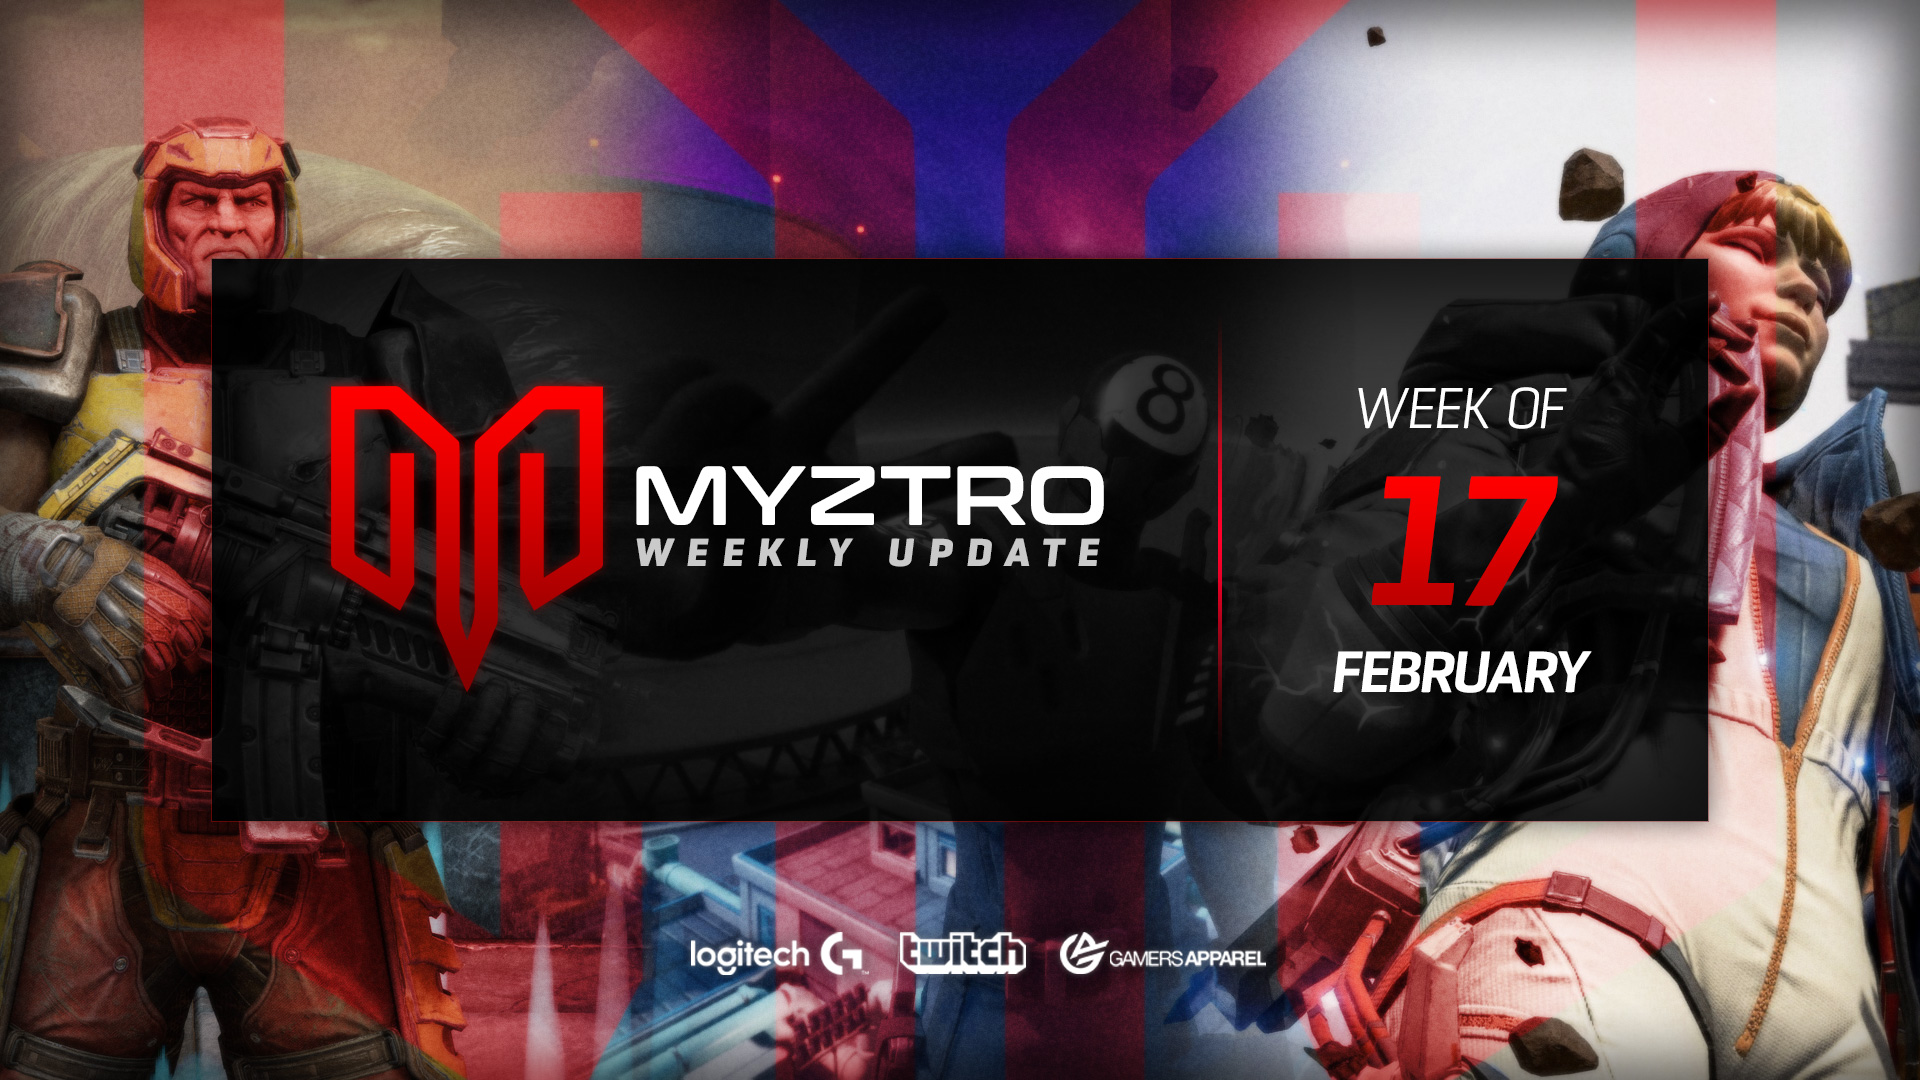 Myztro Weekly Update 12: 2/19/20